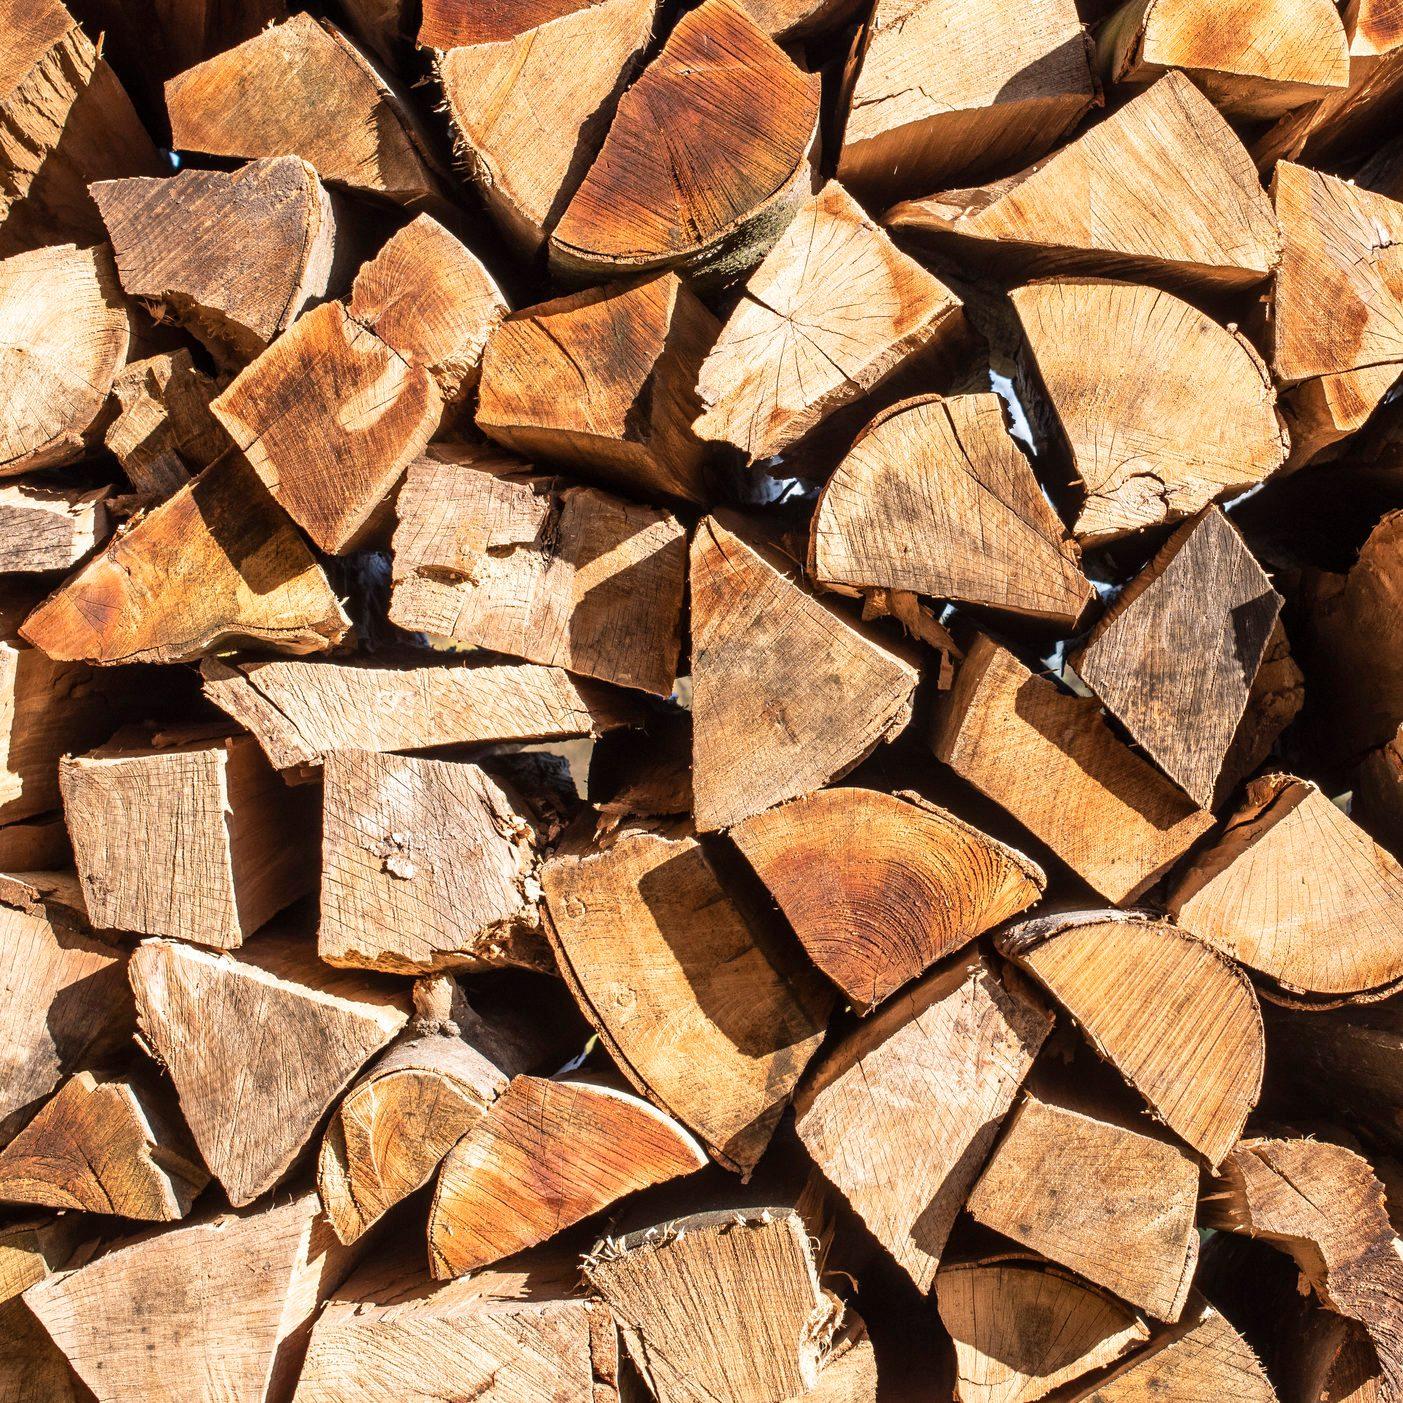 Gestapeltes Brennholz für den Winter